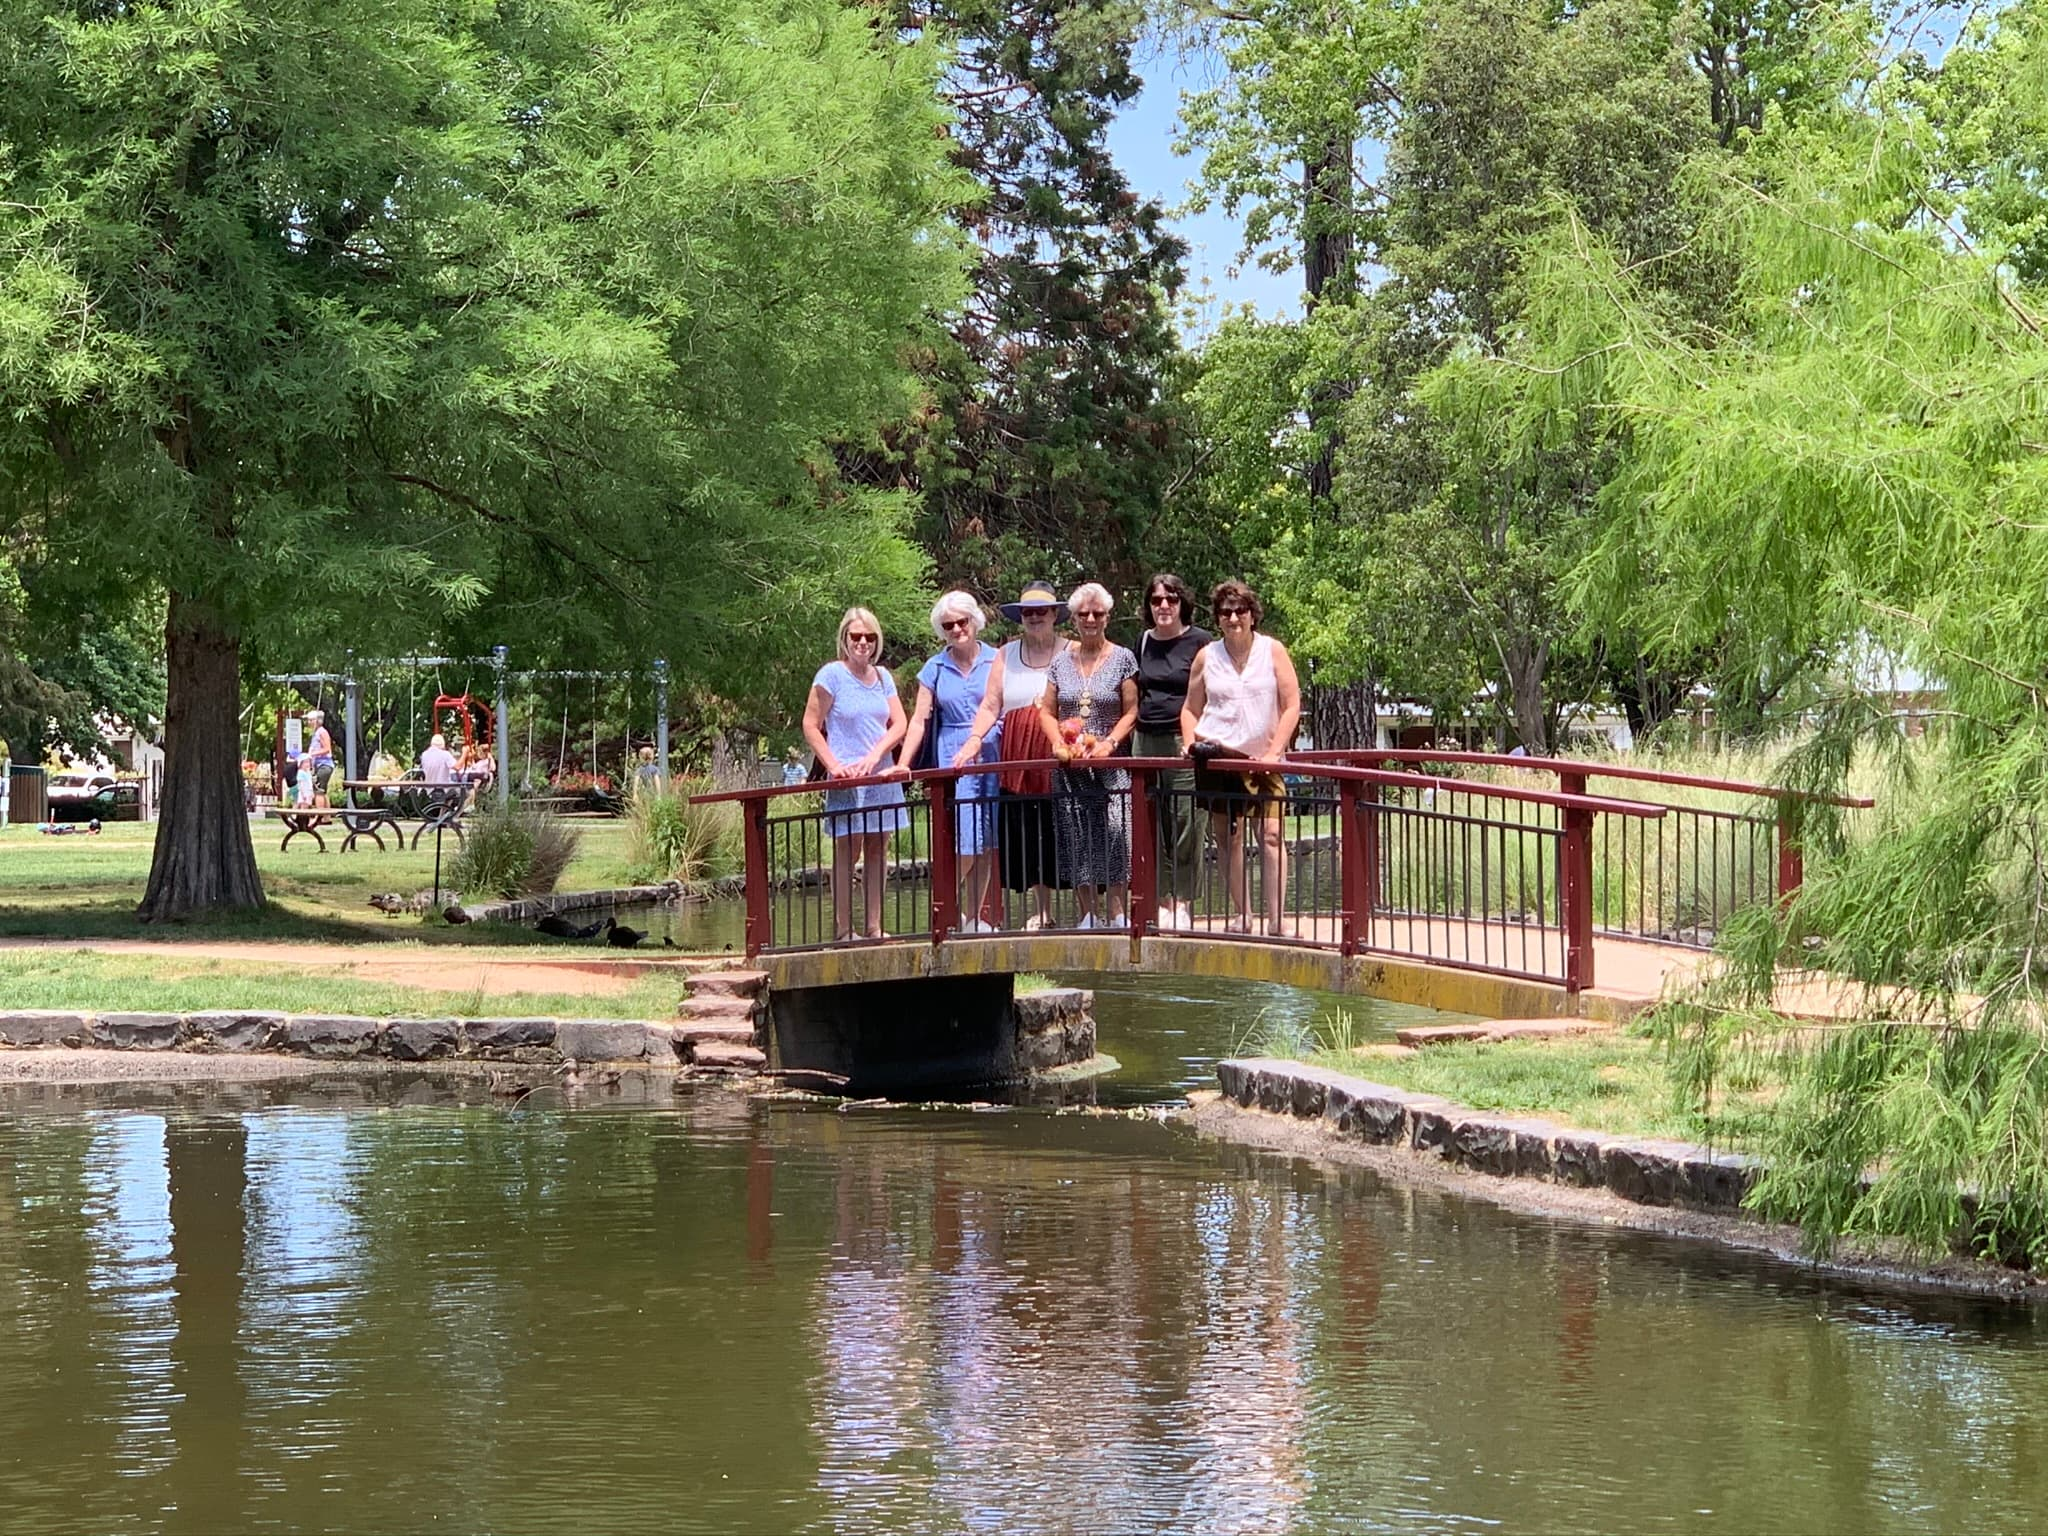 6 ladies standing on bridge over duck pond